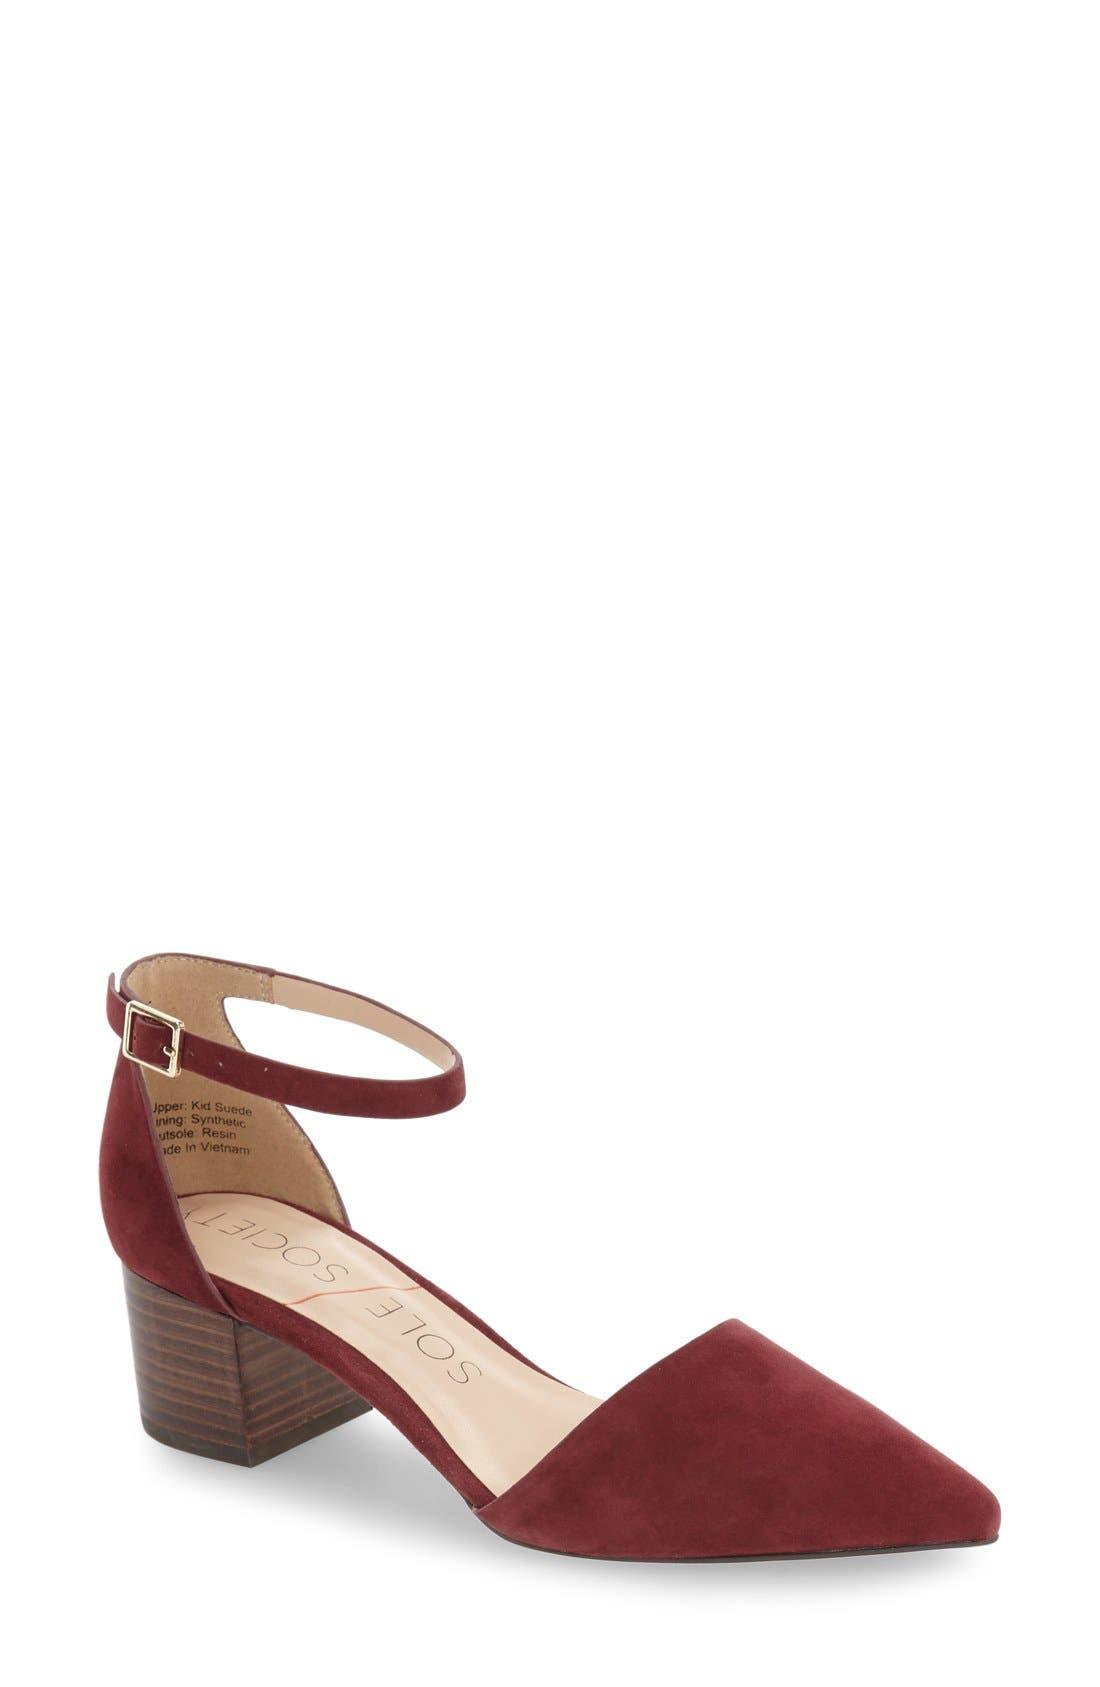 Alternate Image 1 Selected - Sole Society 'Katarina' Block Heel Pump (Women)